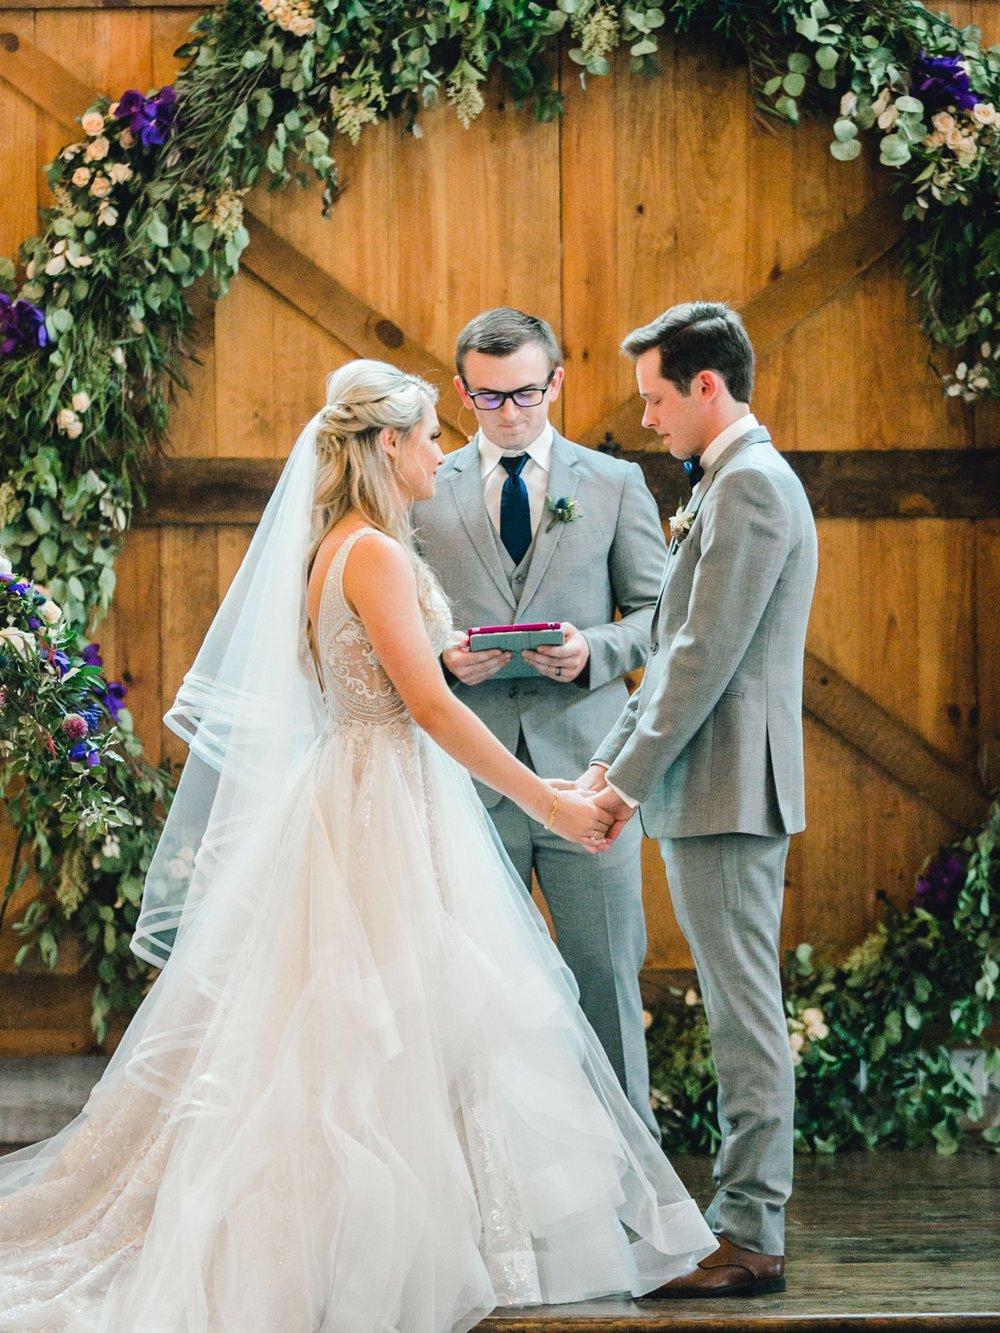 KAITLYN_AND_ZACHARY_HUNT_ALLEEJ_LUBBOCK_WEDDING_PHOTOGRAPHER_EBERLEY_BROOKS_EVENTS_0110.jpg